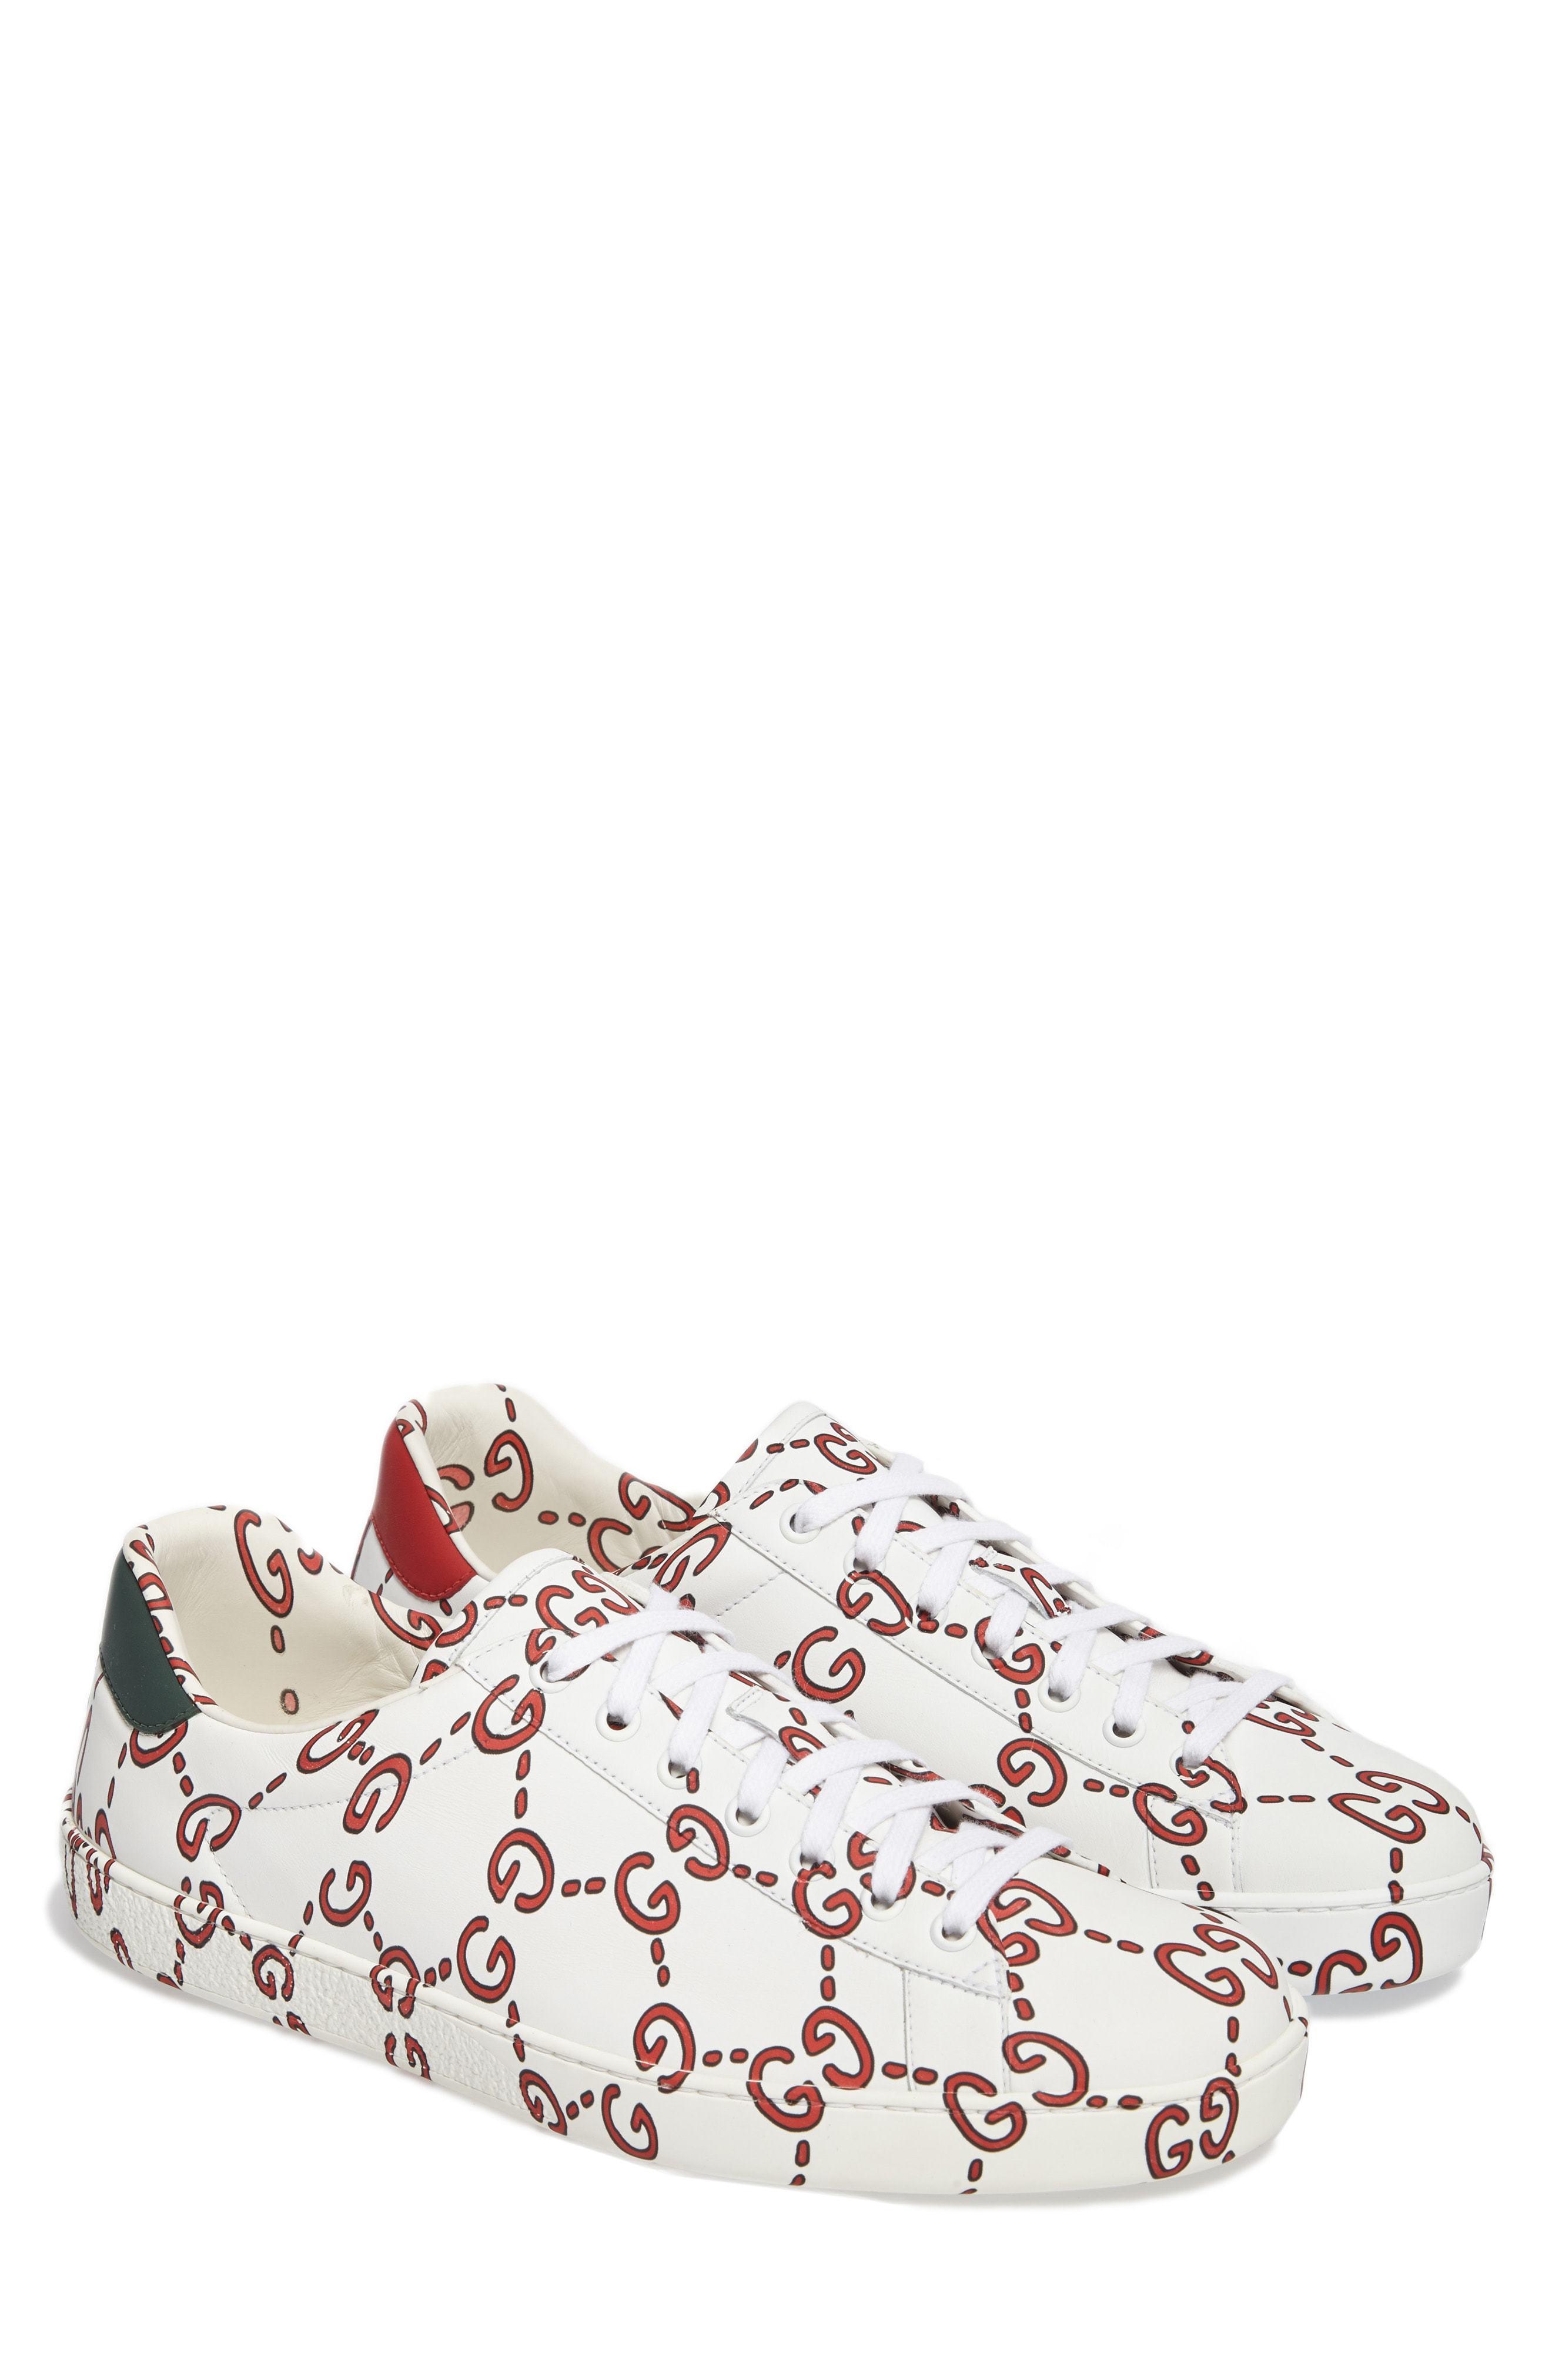 Gucci New Ace Gg Print Sneaker, $830